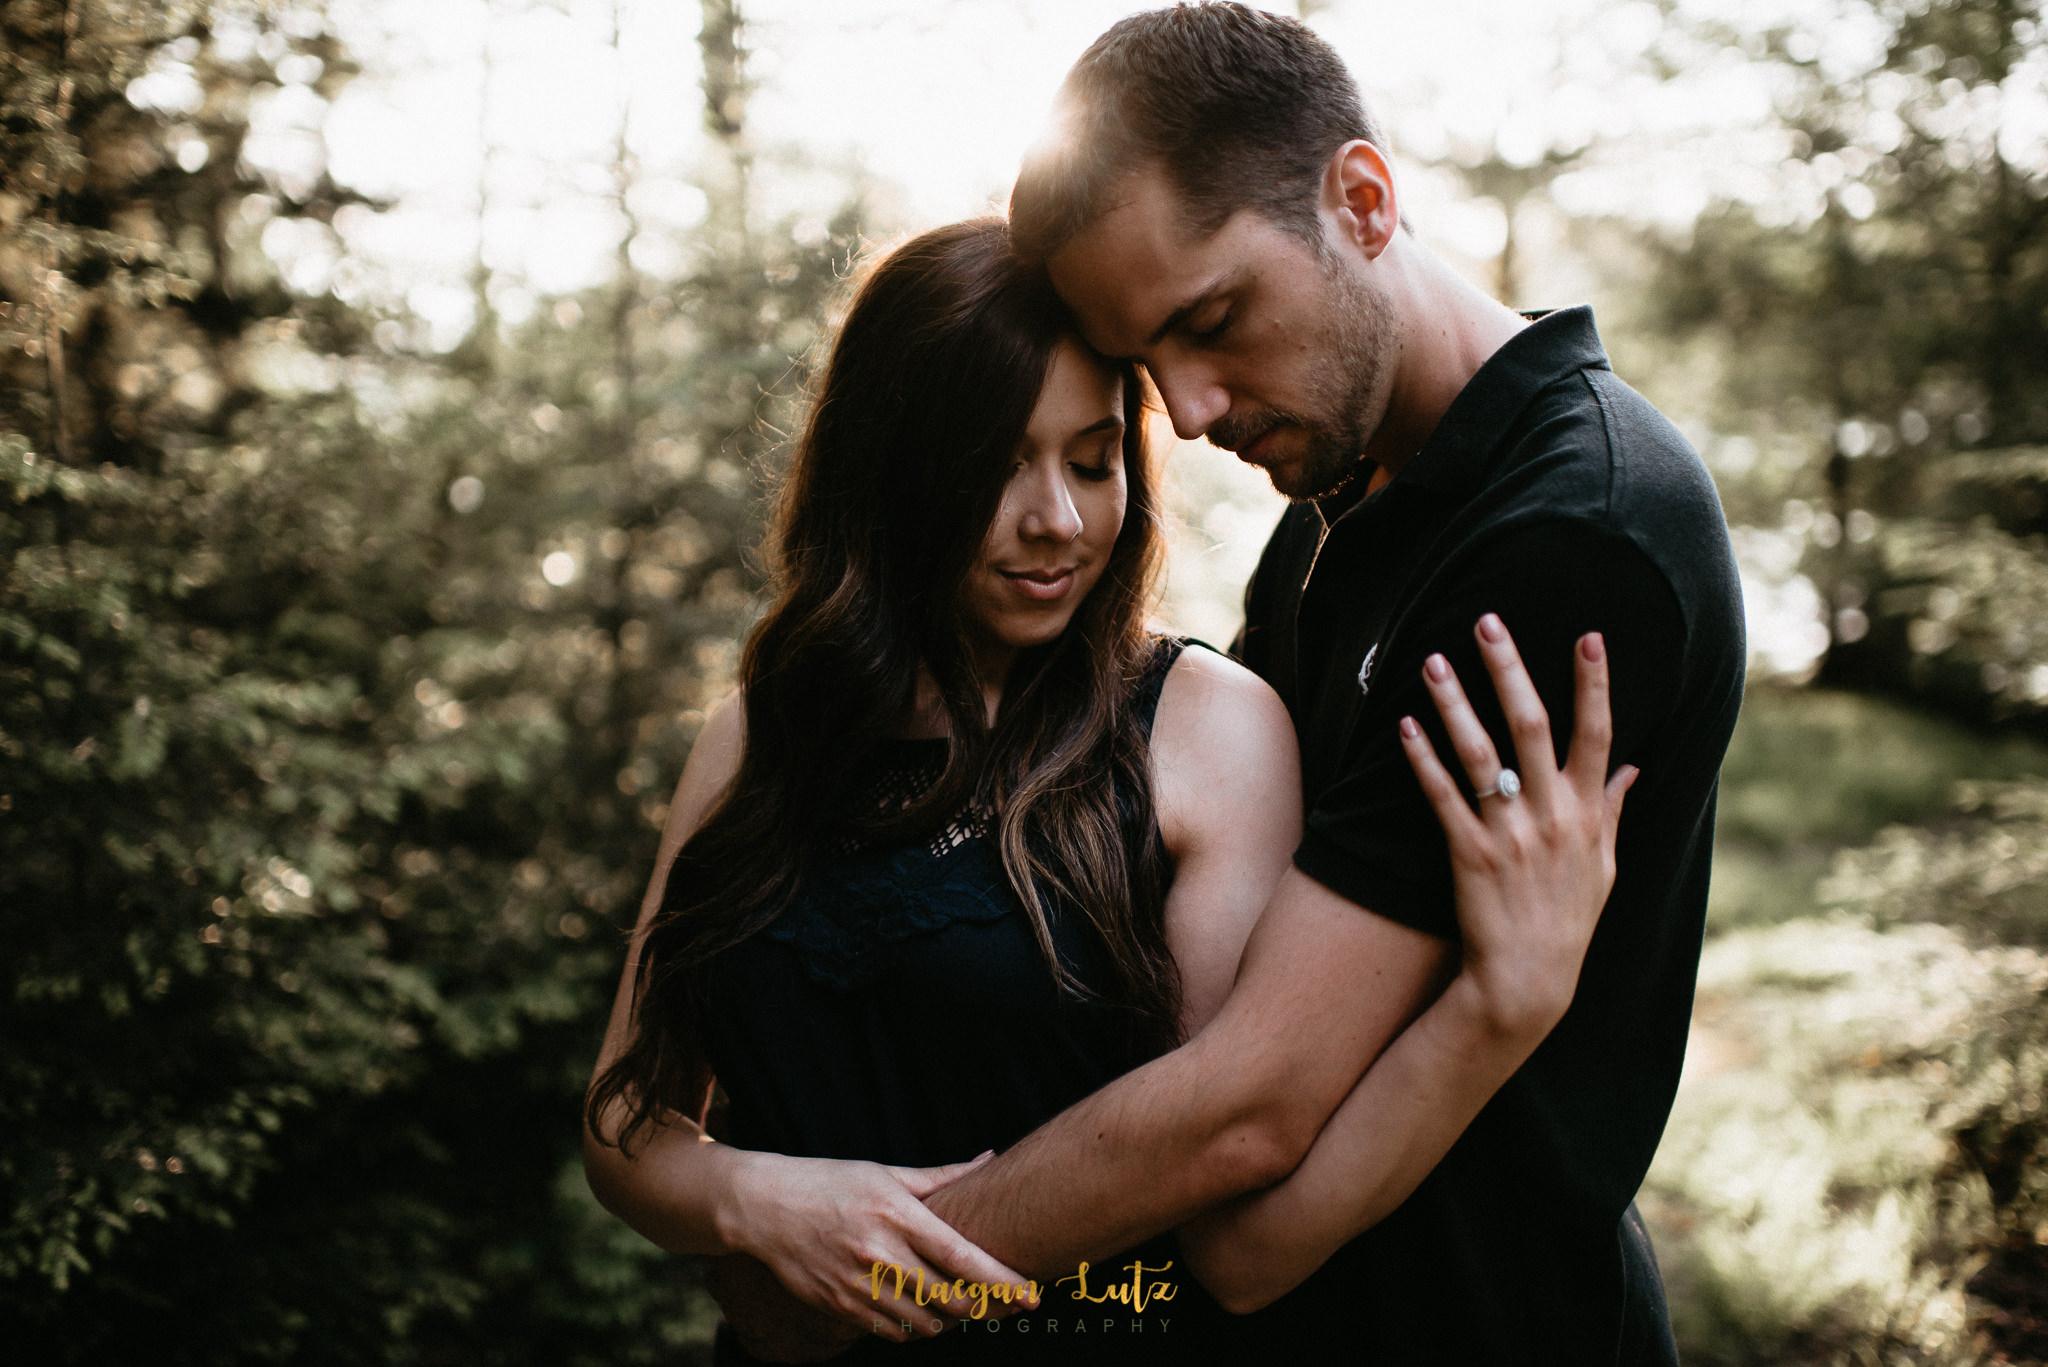 NEPA-Engagement-Wedding-Photographer-Session-at-Ricketts-Glen-State-Park-39.jpg